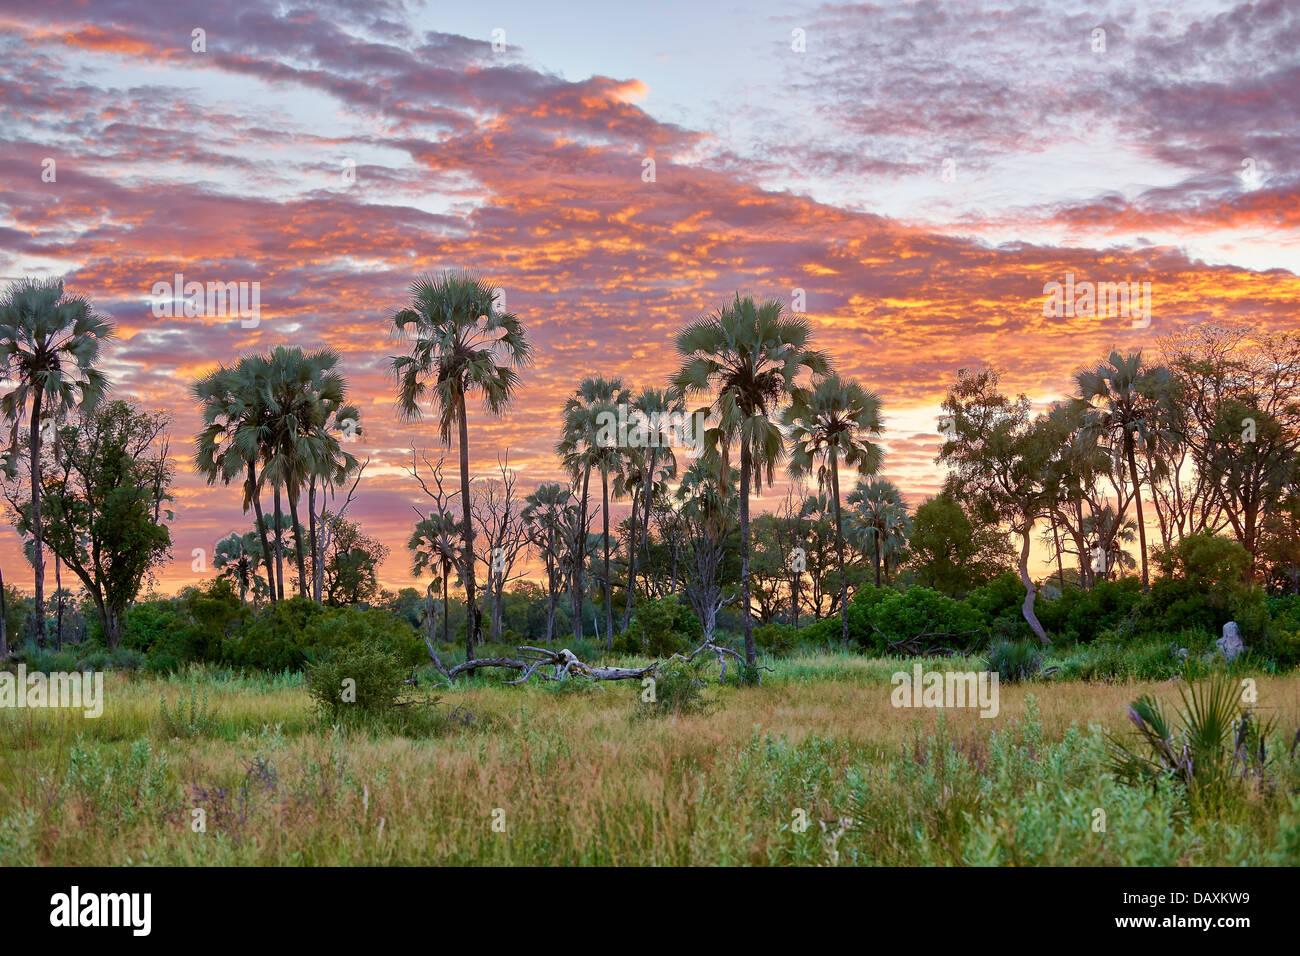 Sonnenaufgang mit Wolken hinter Palmen in Chitabe, Okavango Delta, Botswana, Afrika Stockbild